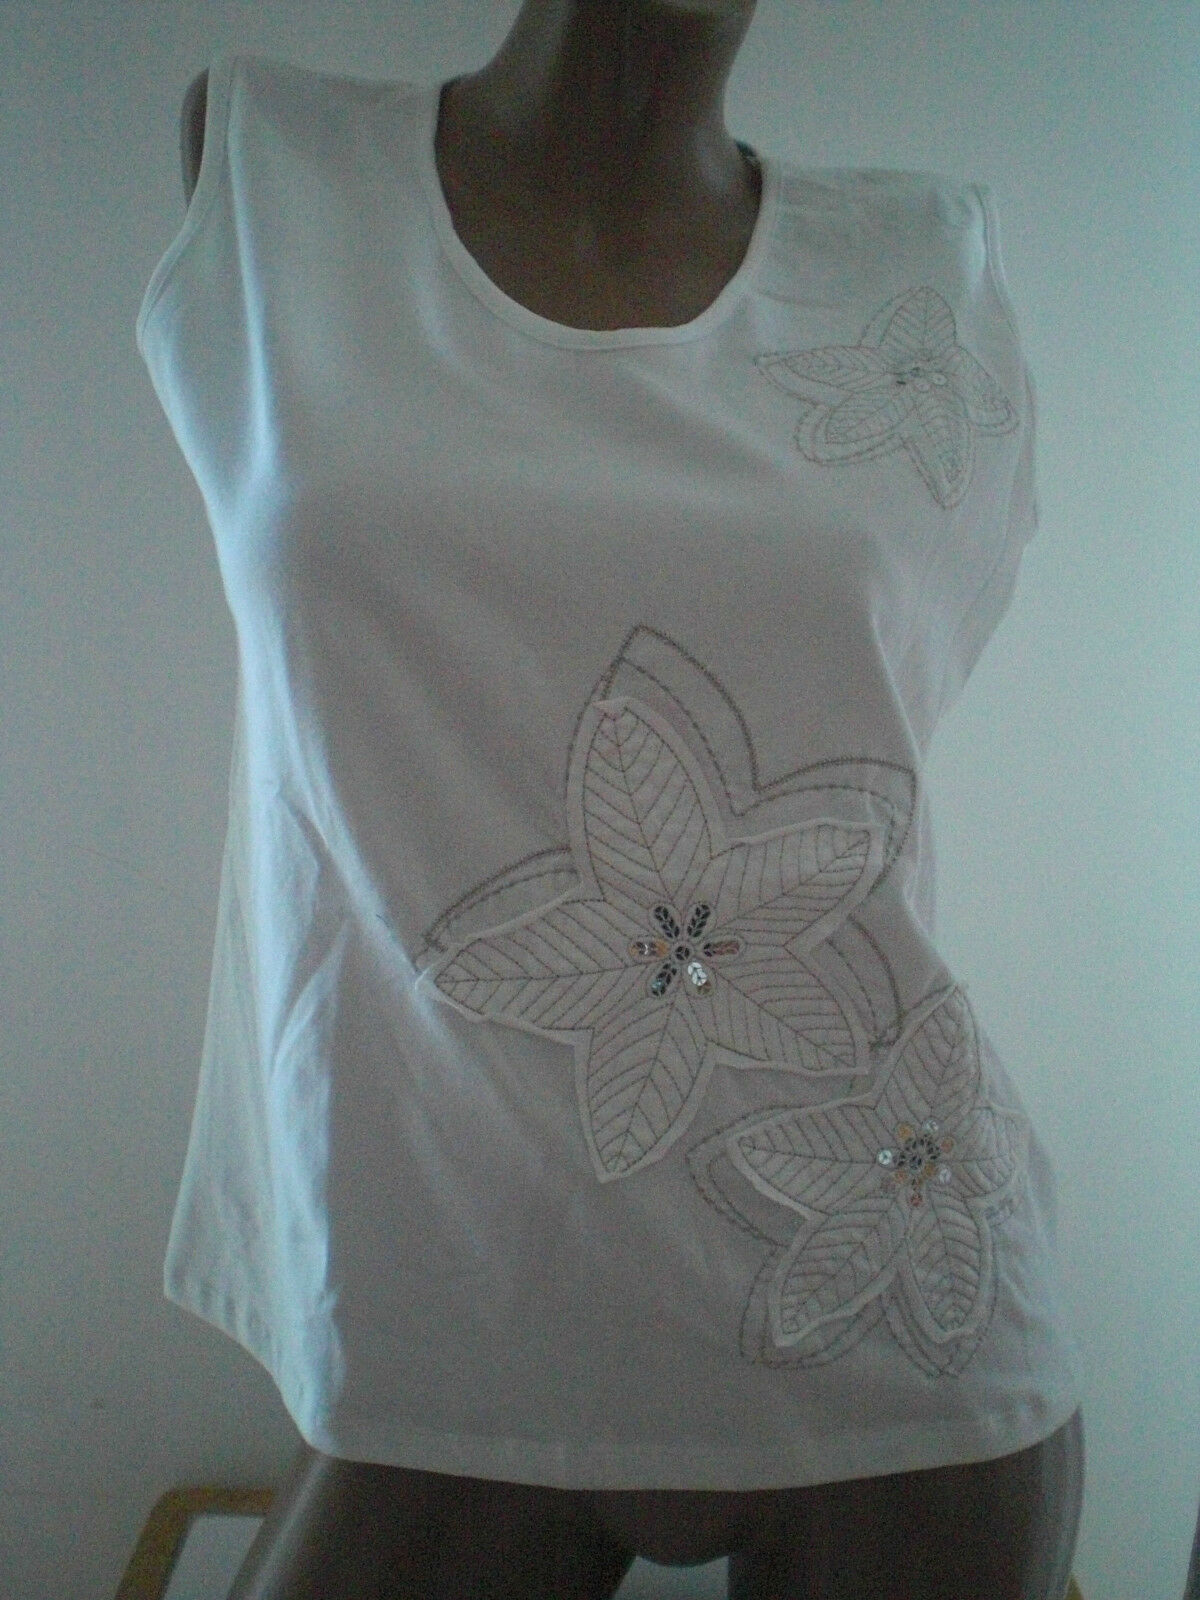 T-shirt woman Size 46 NEW shirt woman REF. 23